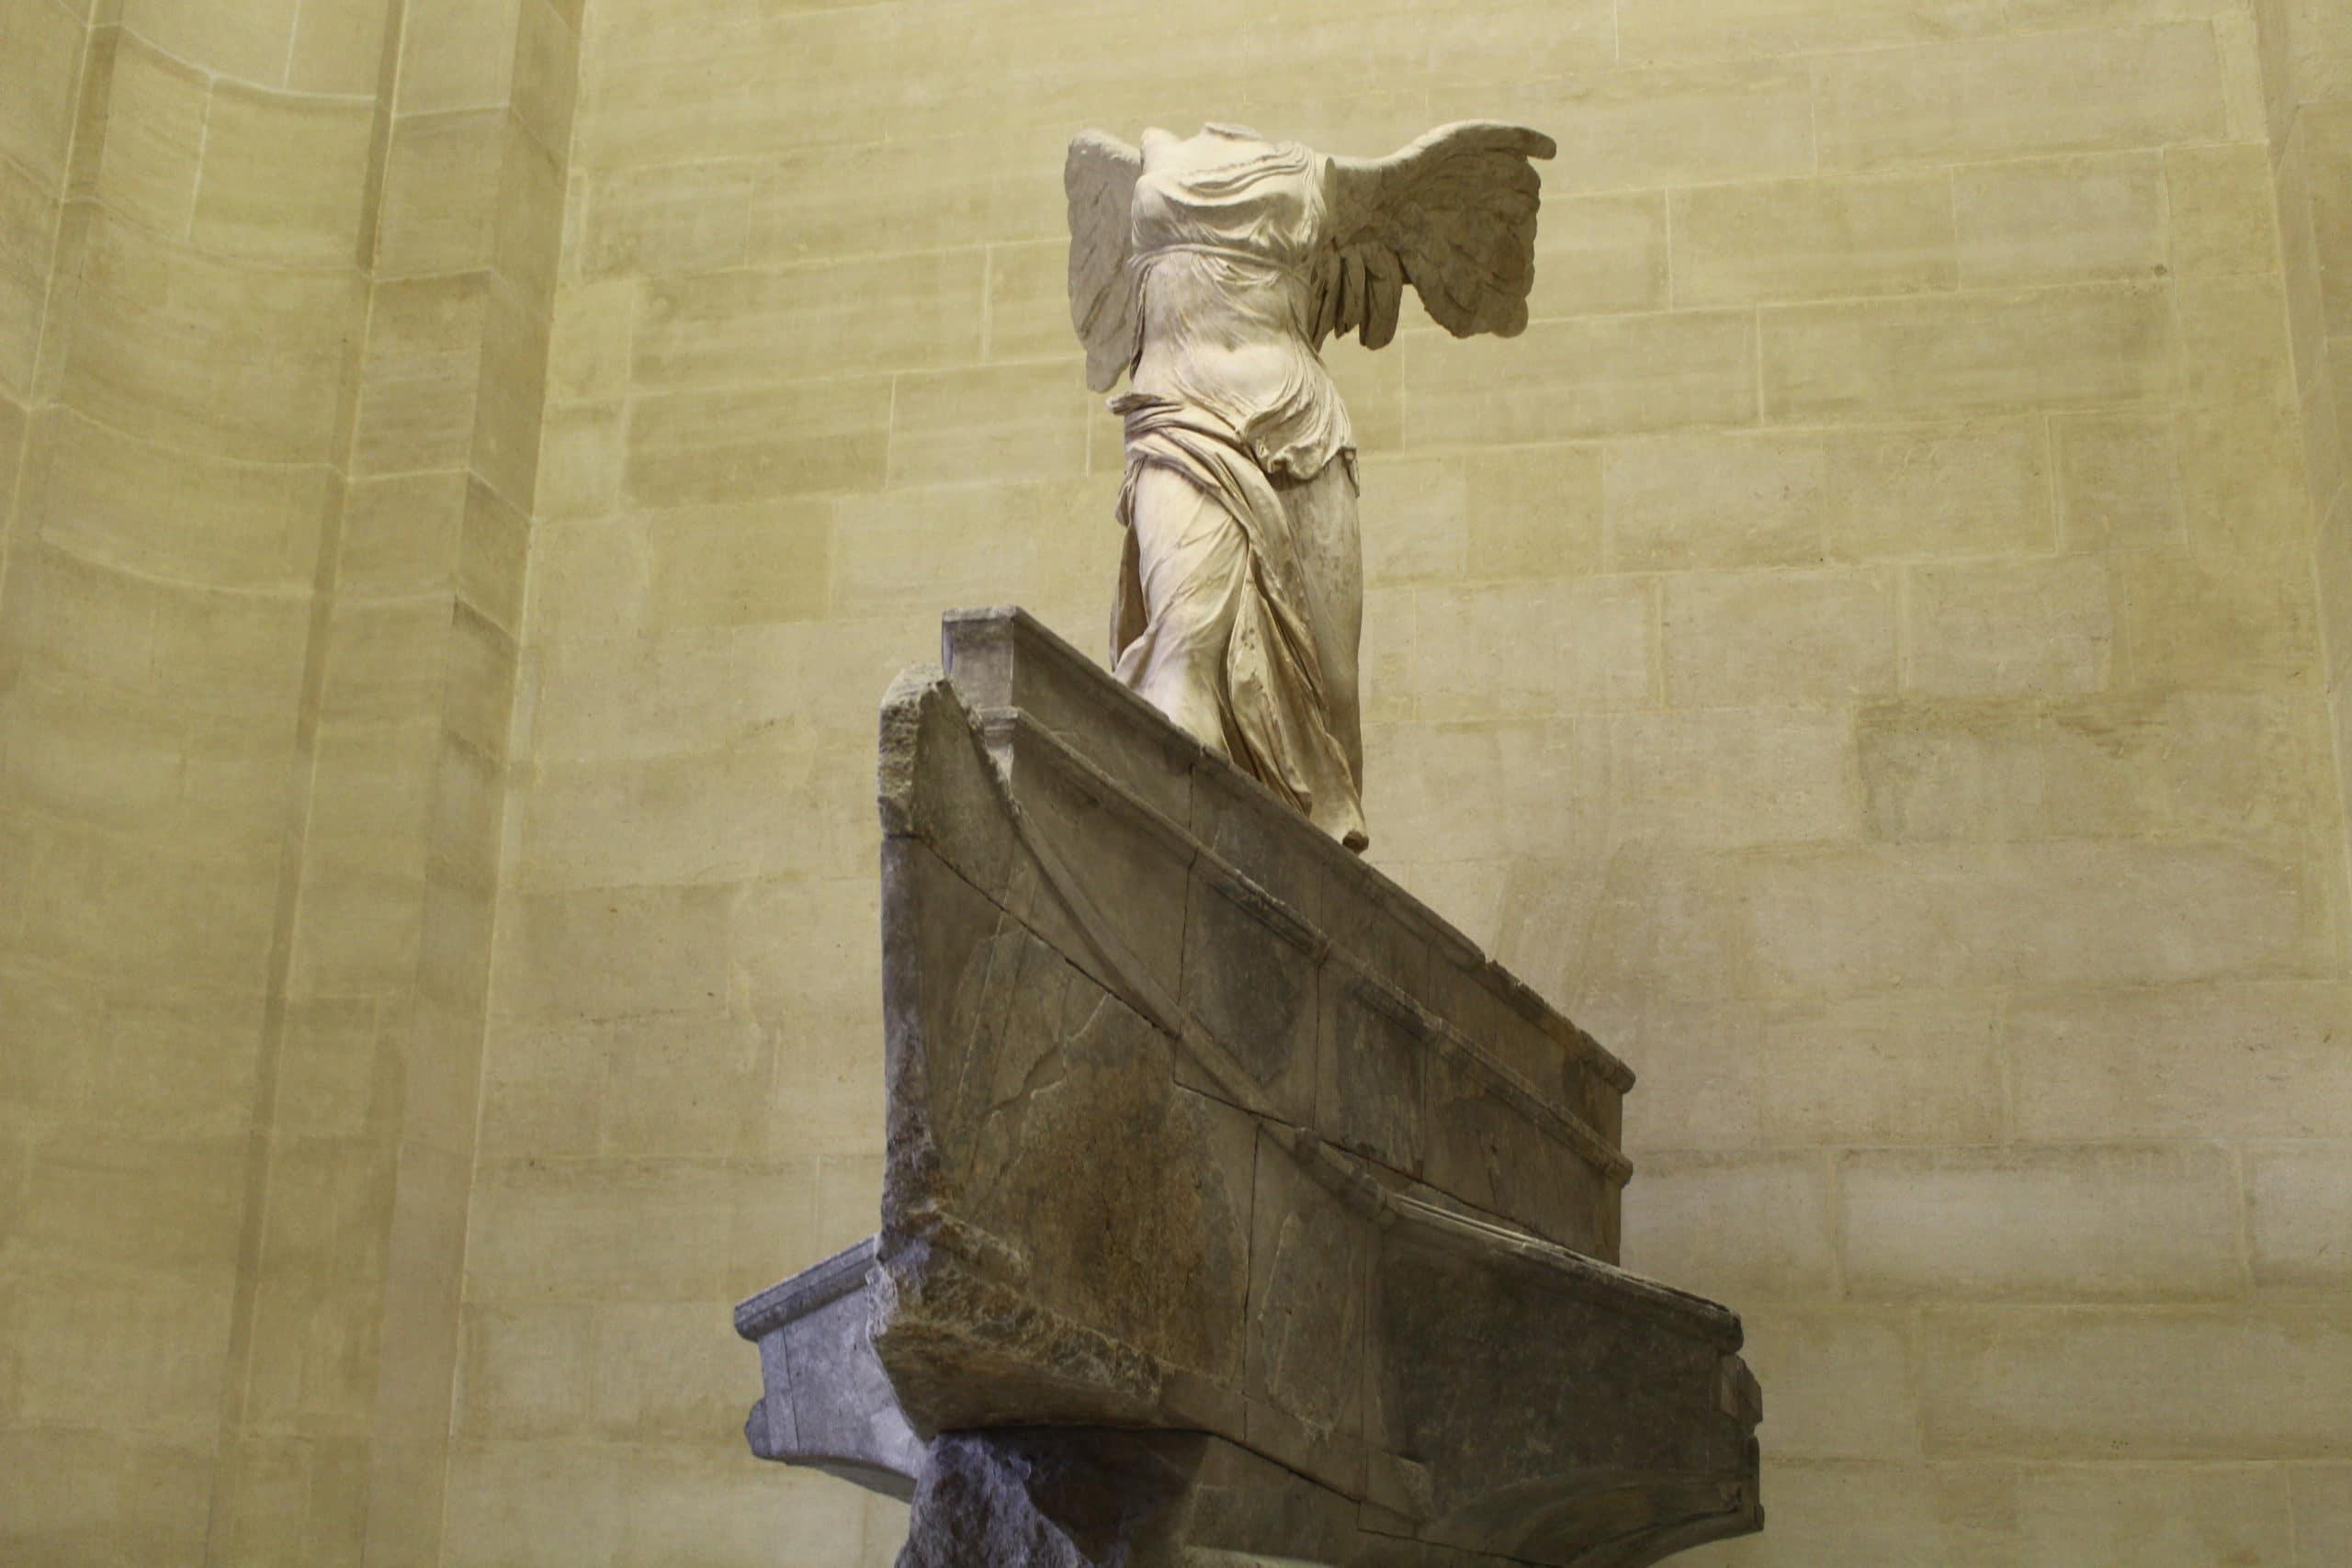 Sculpture 9 - Louvre